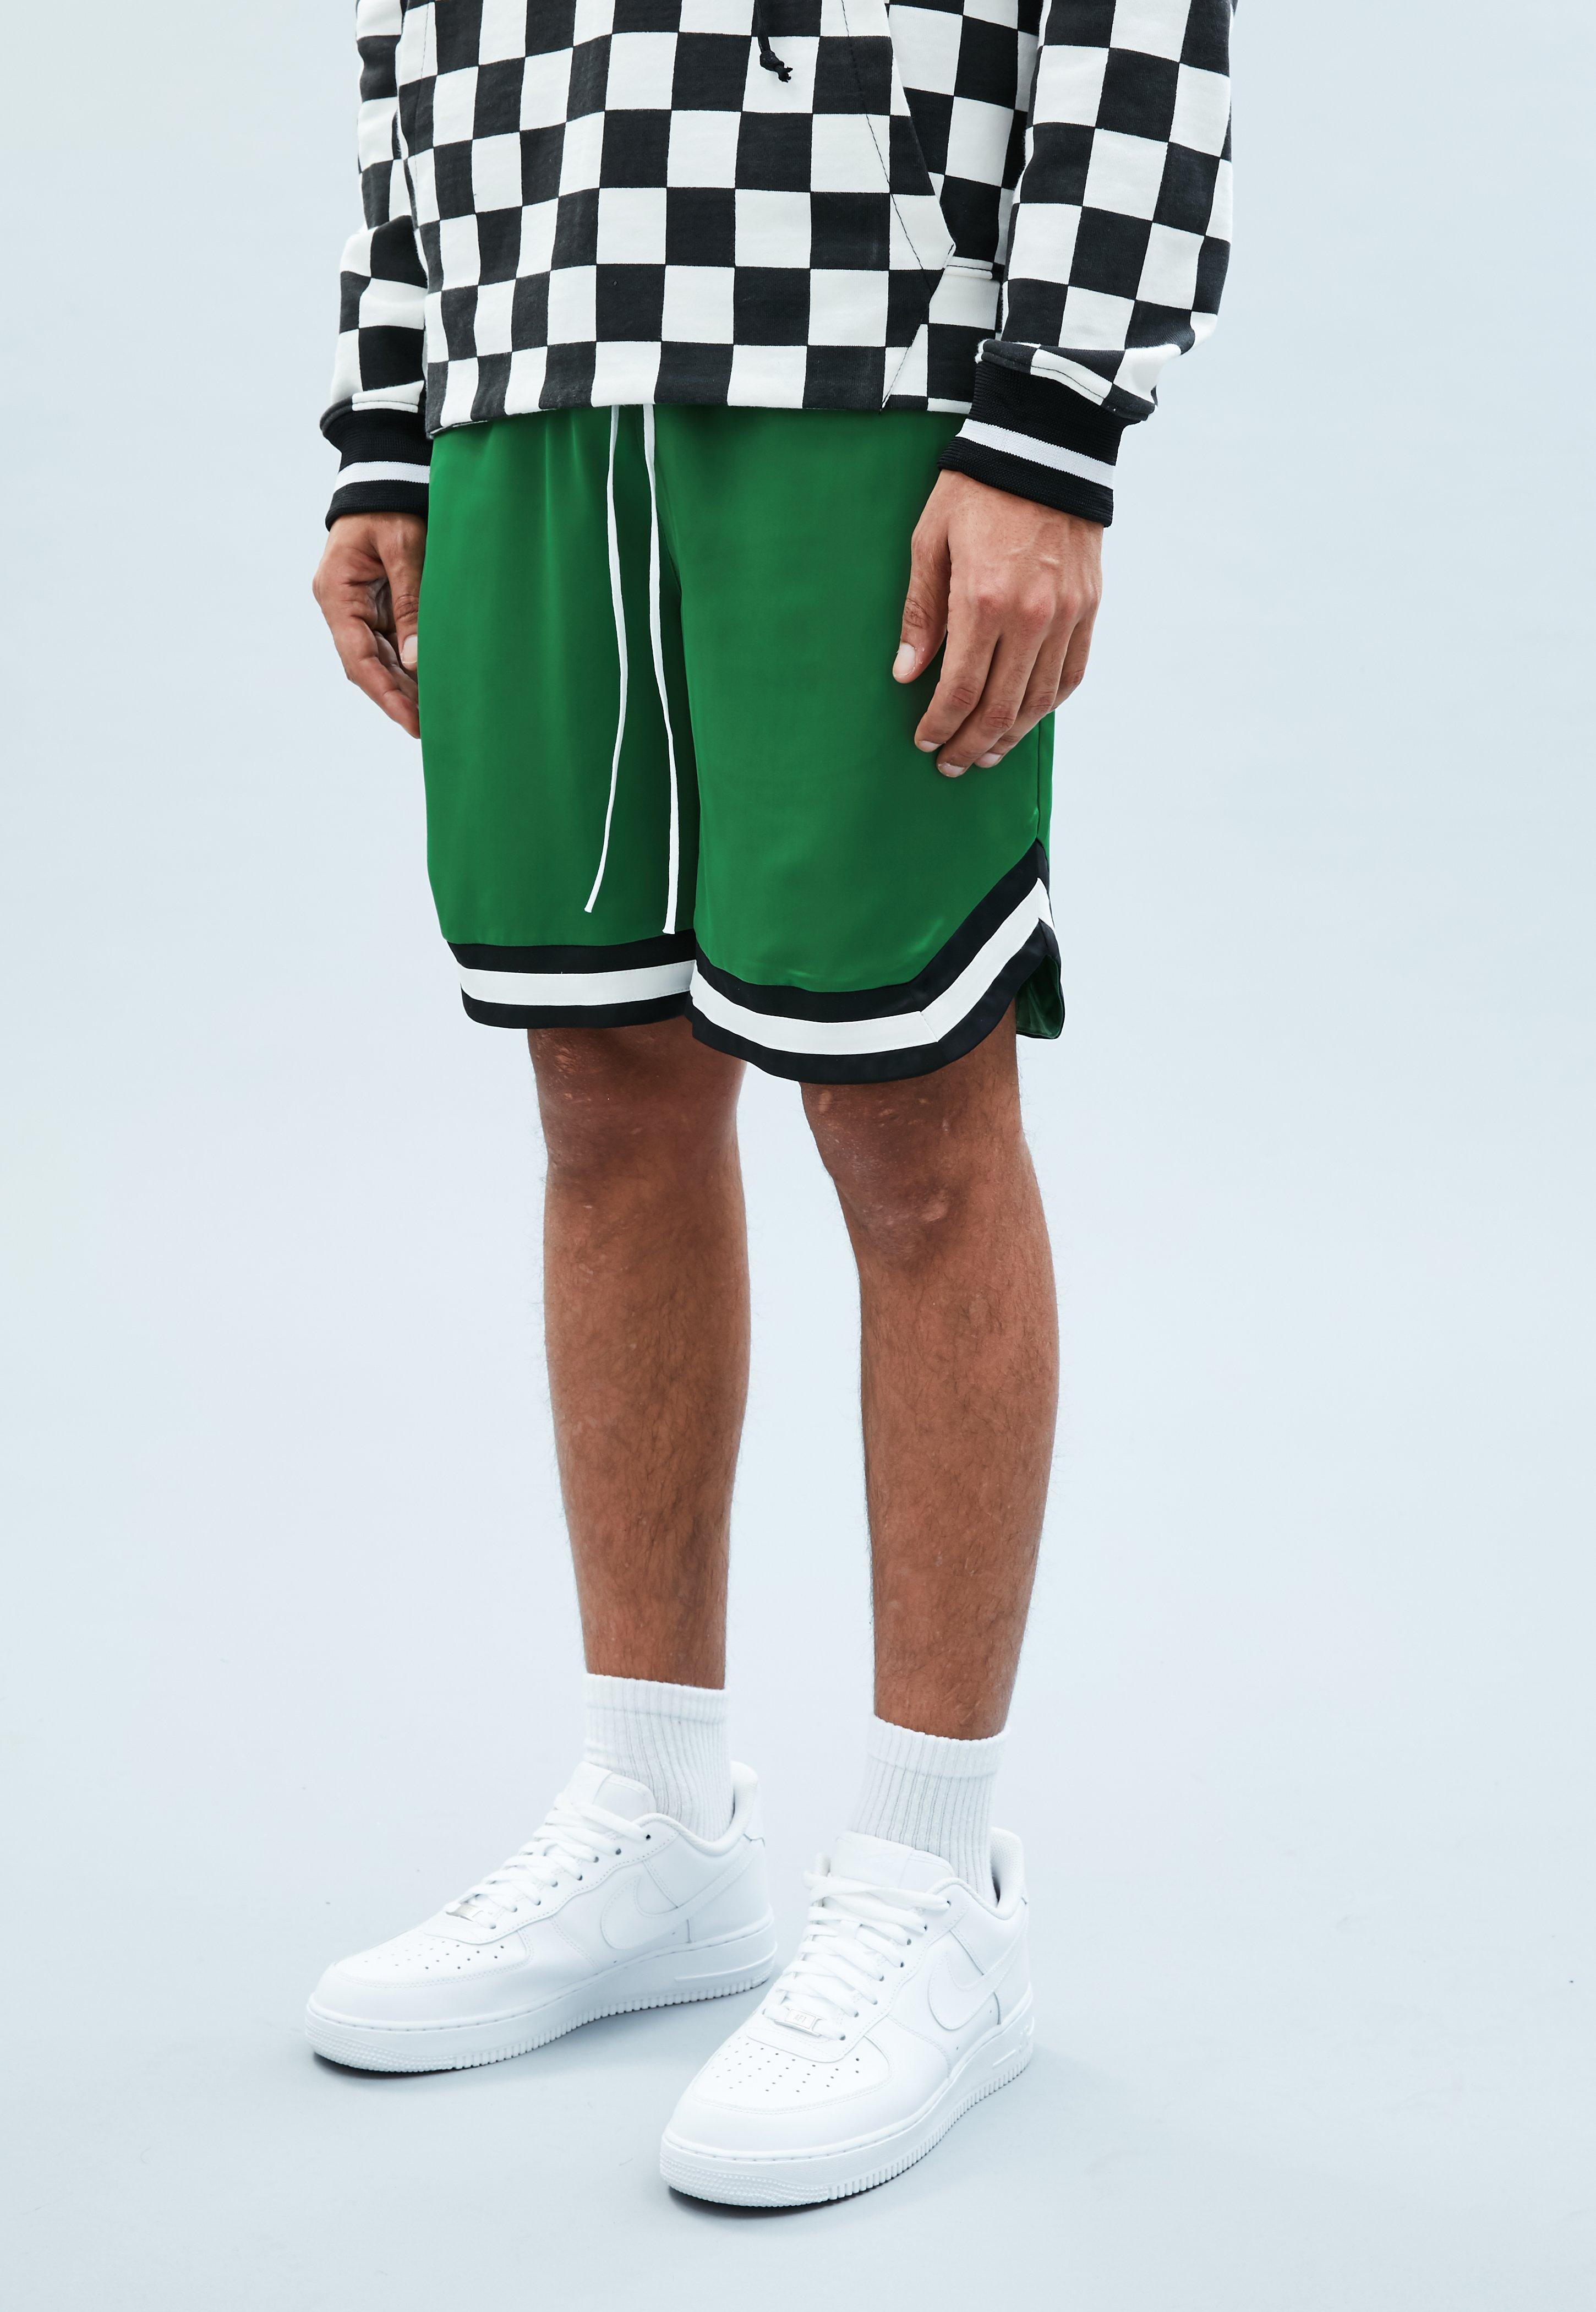 b3a0ec4f7 Green Sateen Basketball Shorts